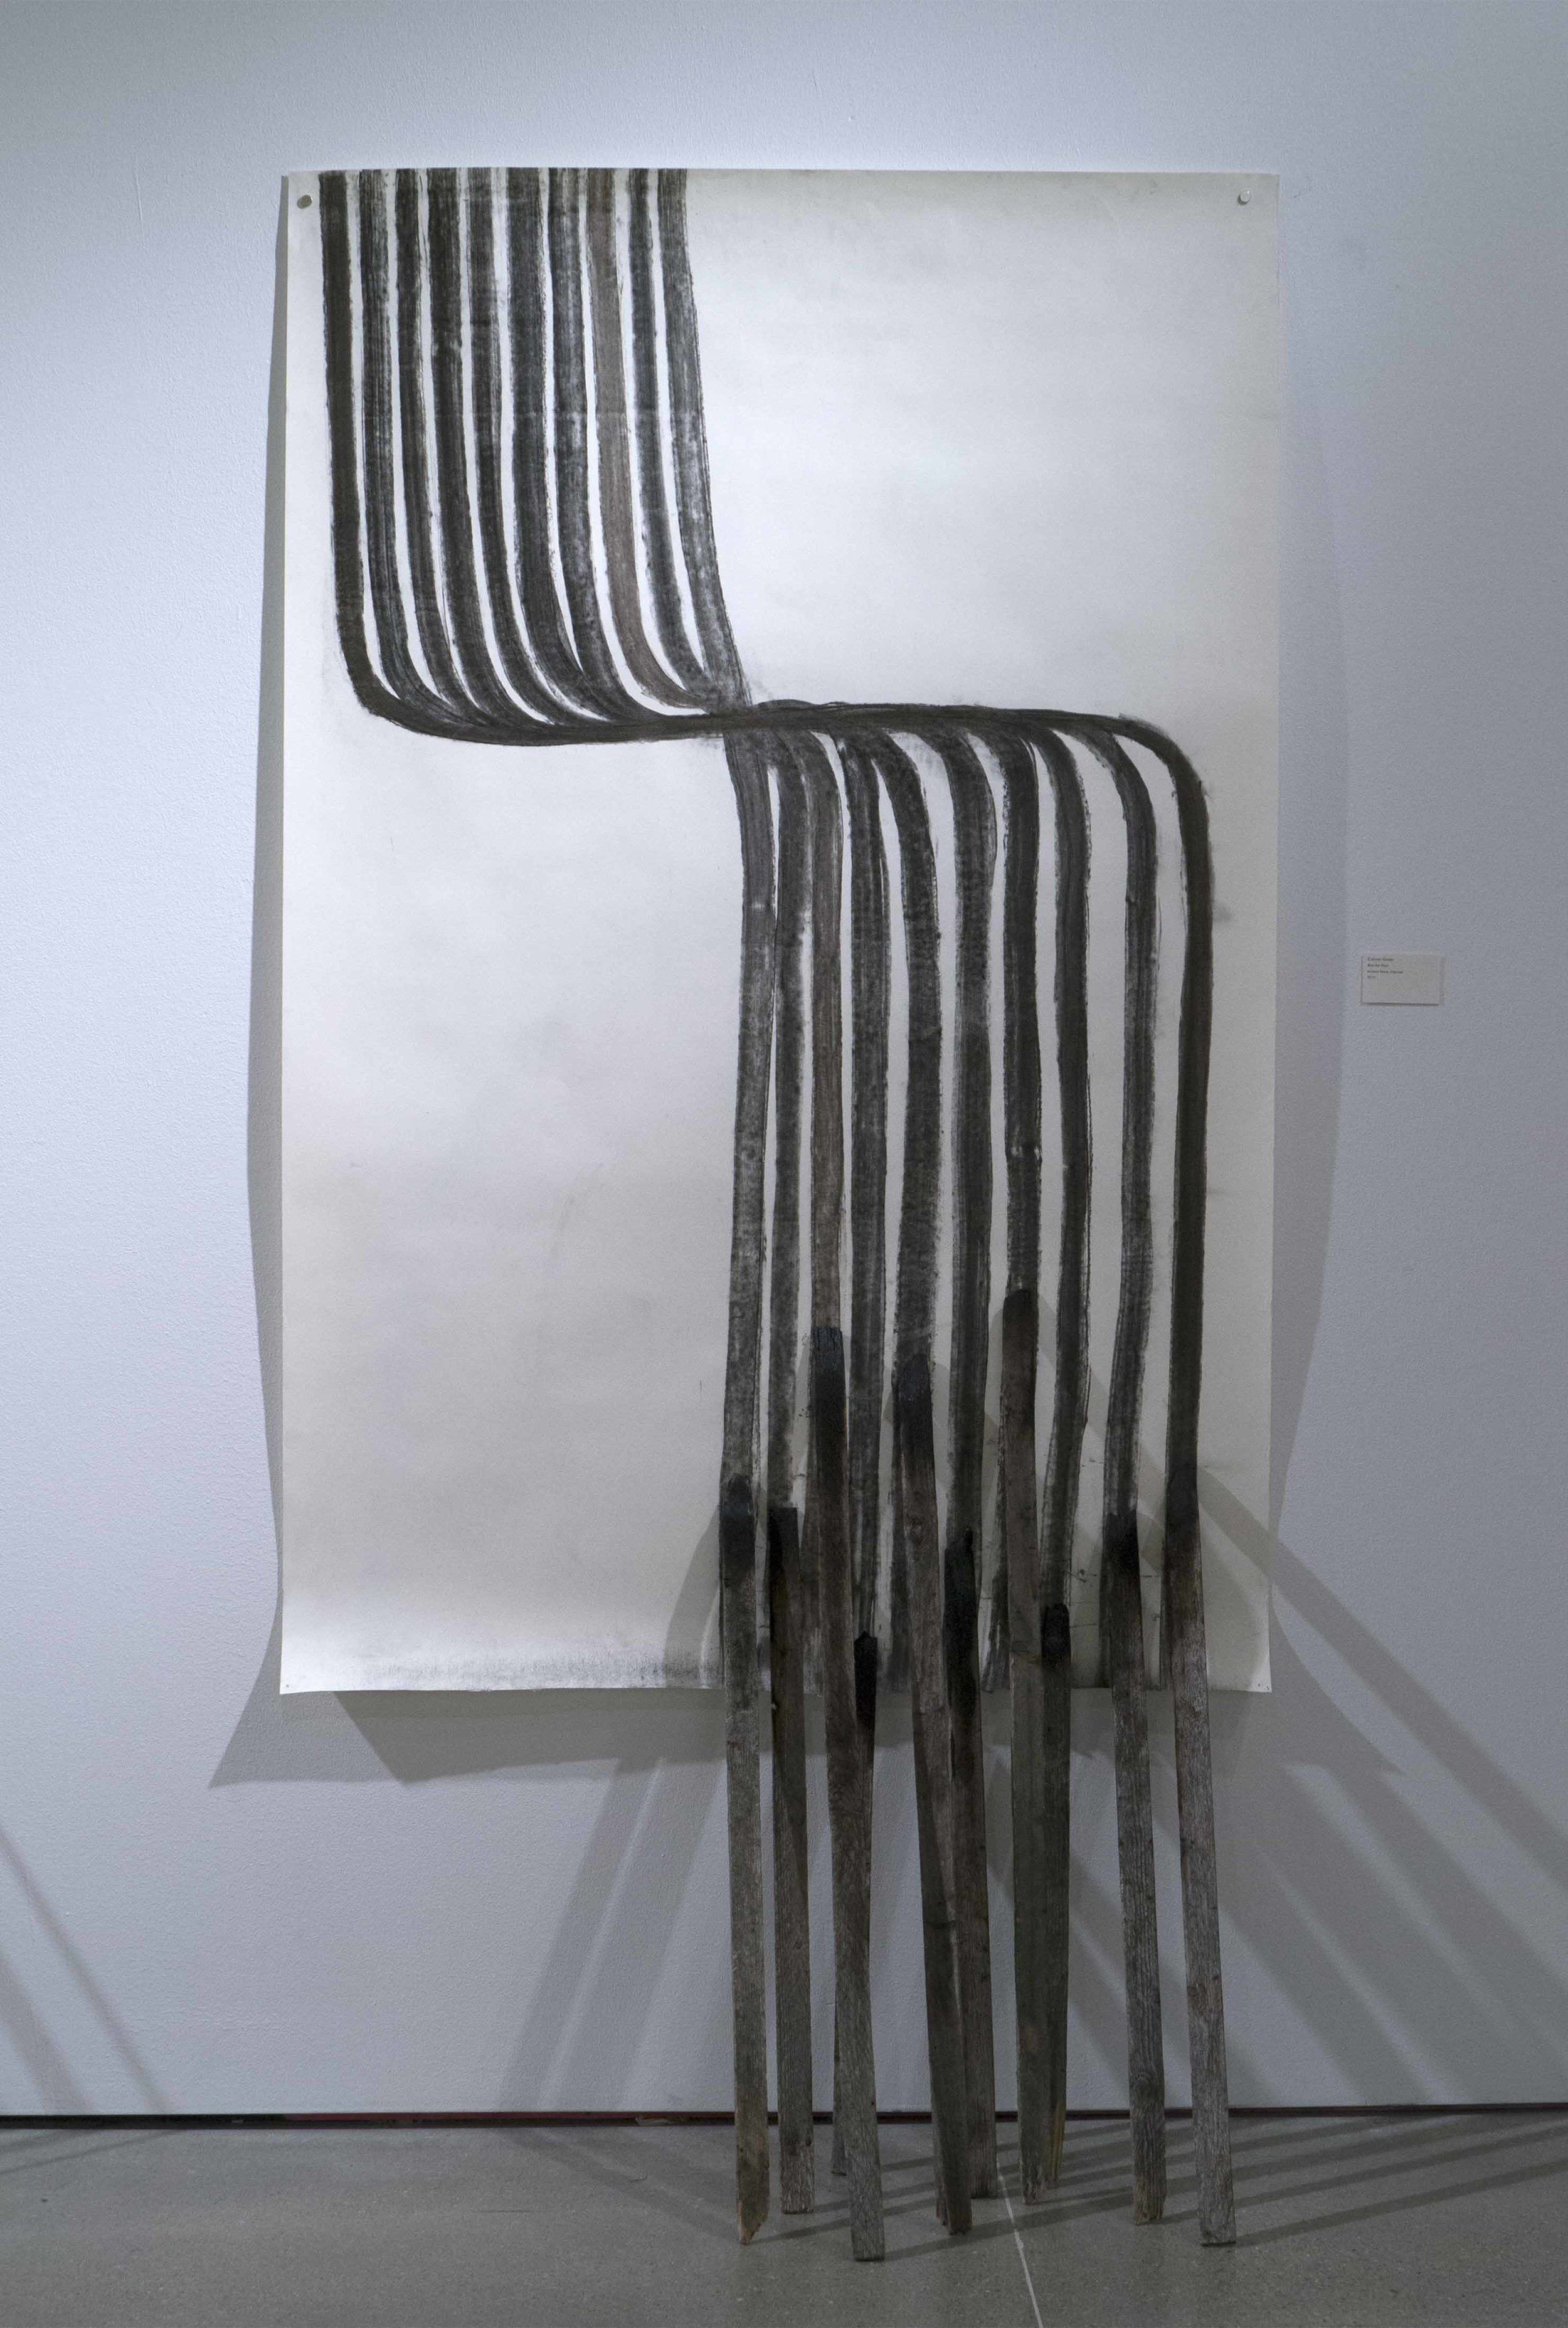 JibJab   2013  erosion fence made into charcoal, paper